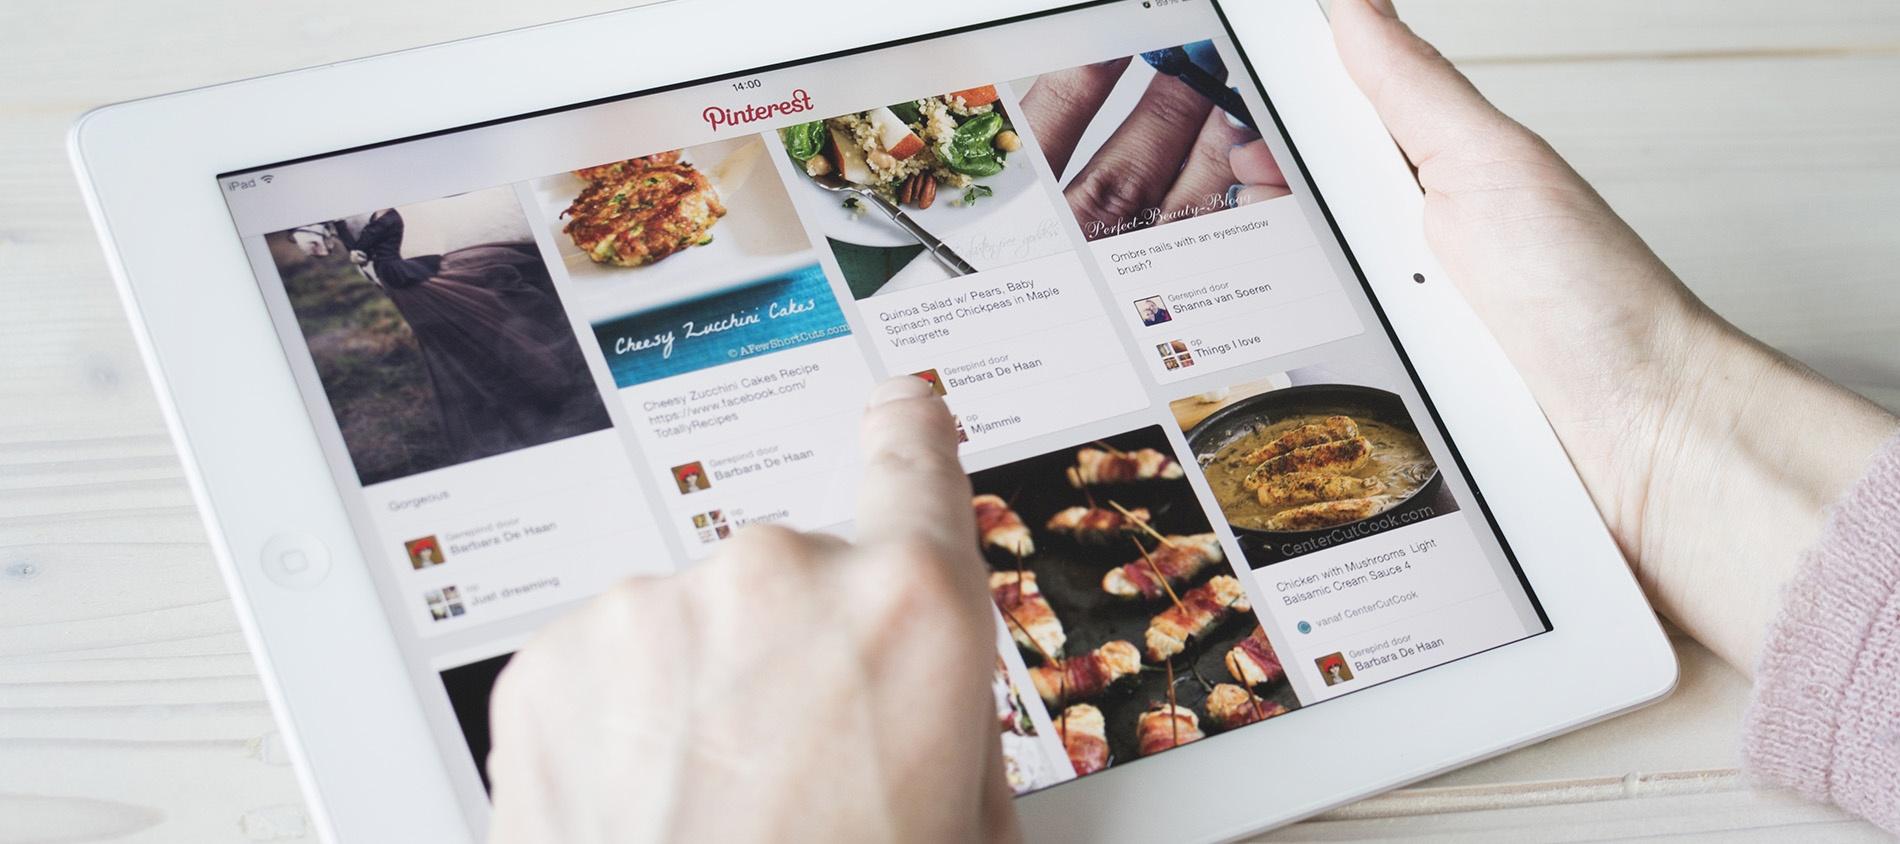 Optimiza Pinterest para atraer clientes a tu negocio.